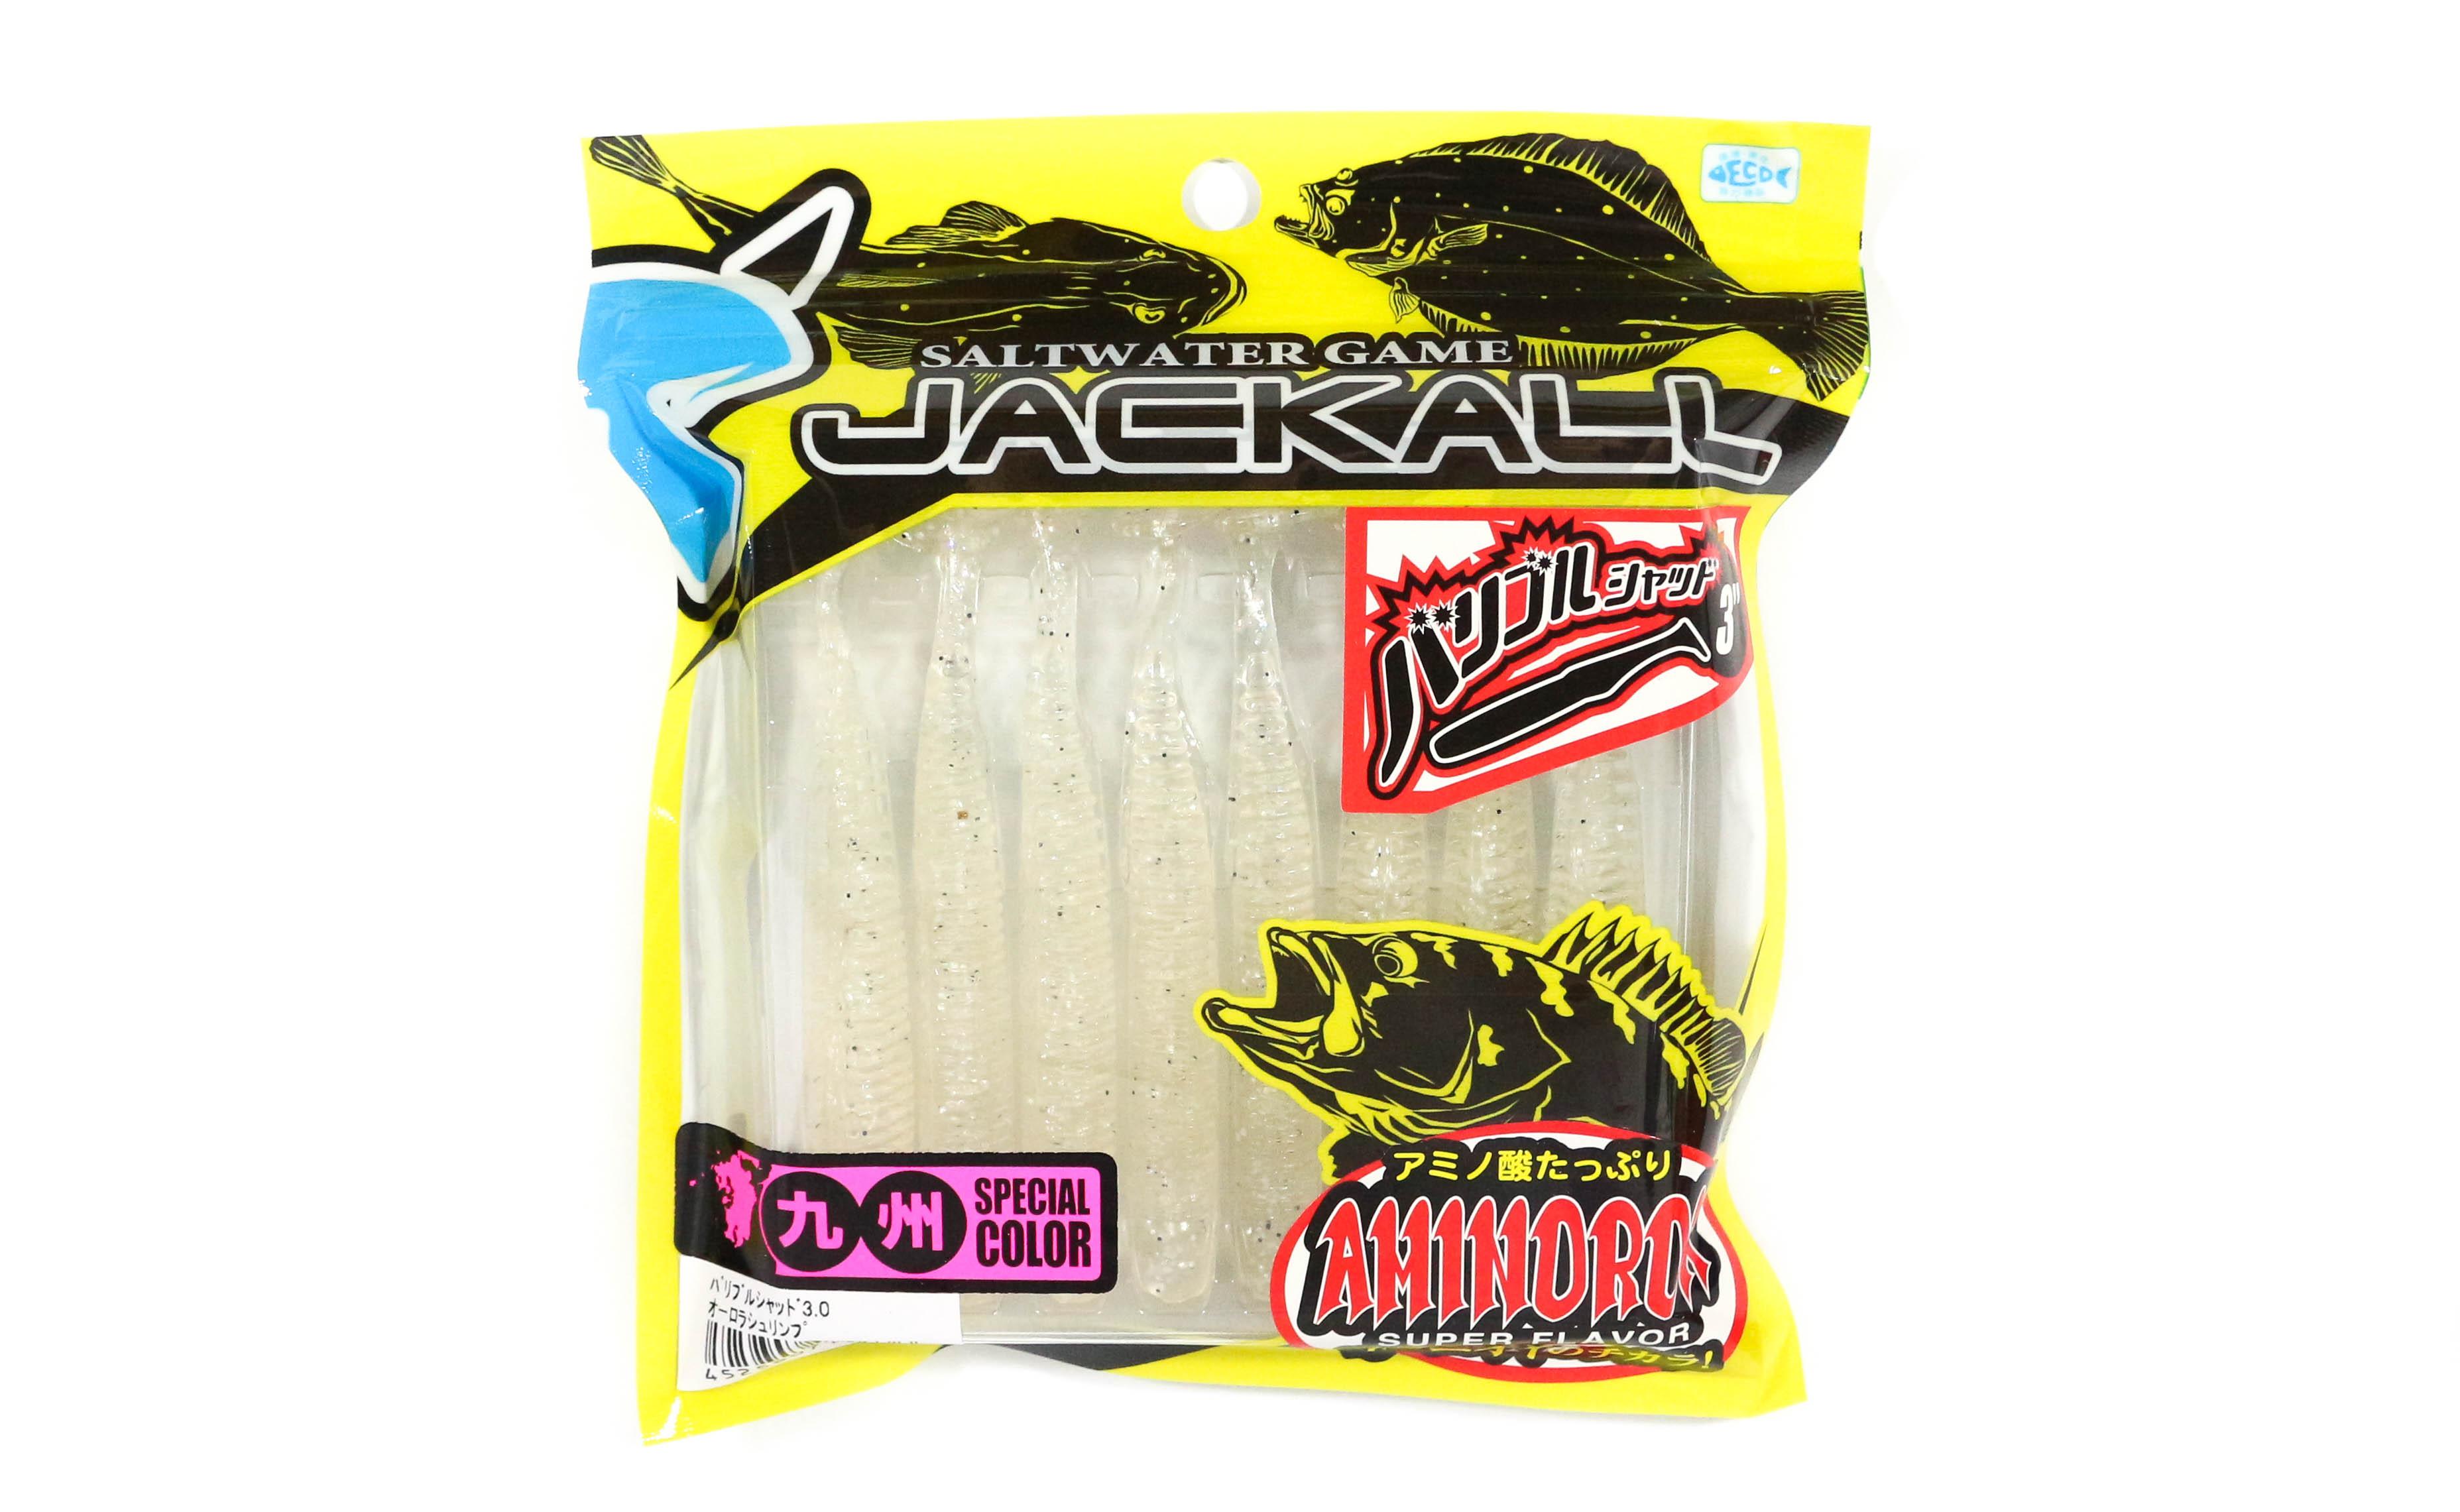 Sale Jackall Soft Lure Bariburu Shad 3.0 Inches Aurora Shrimp (4636)